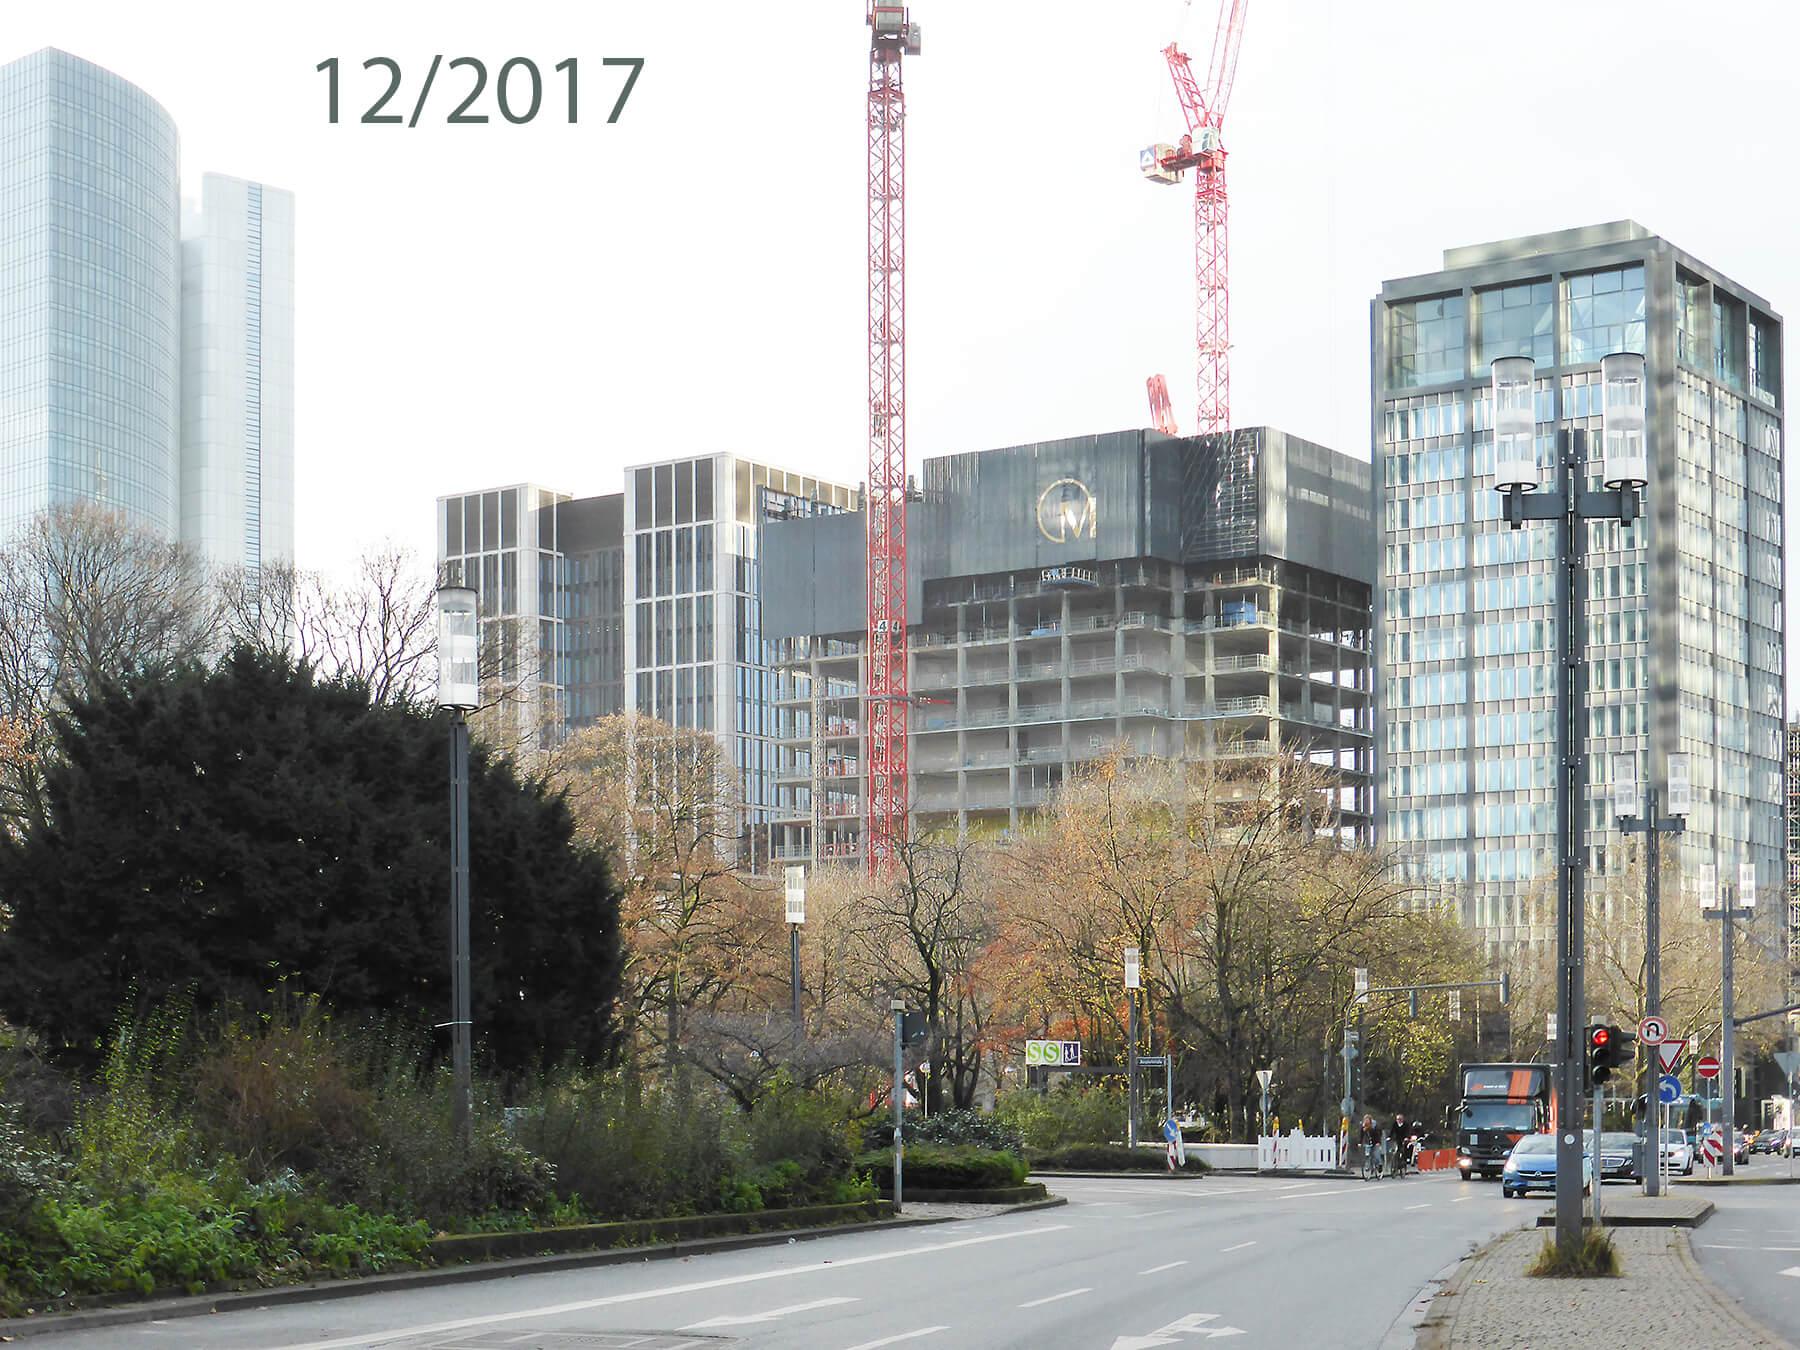 Marienturm in December 2017